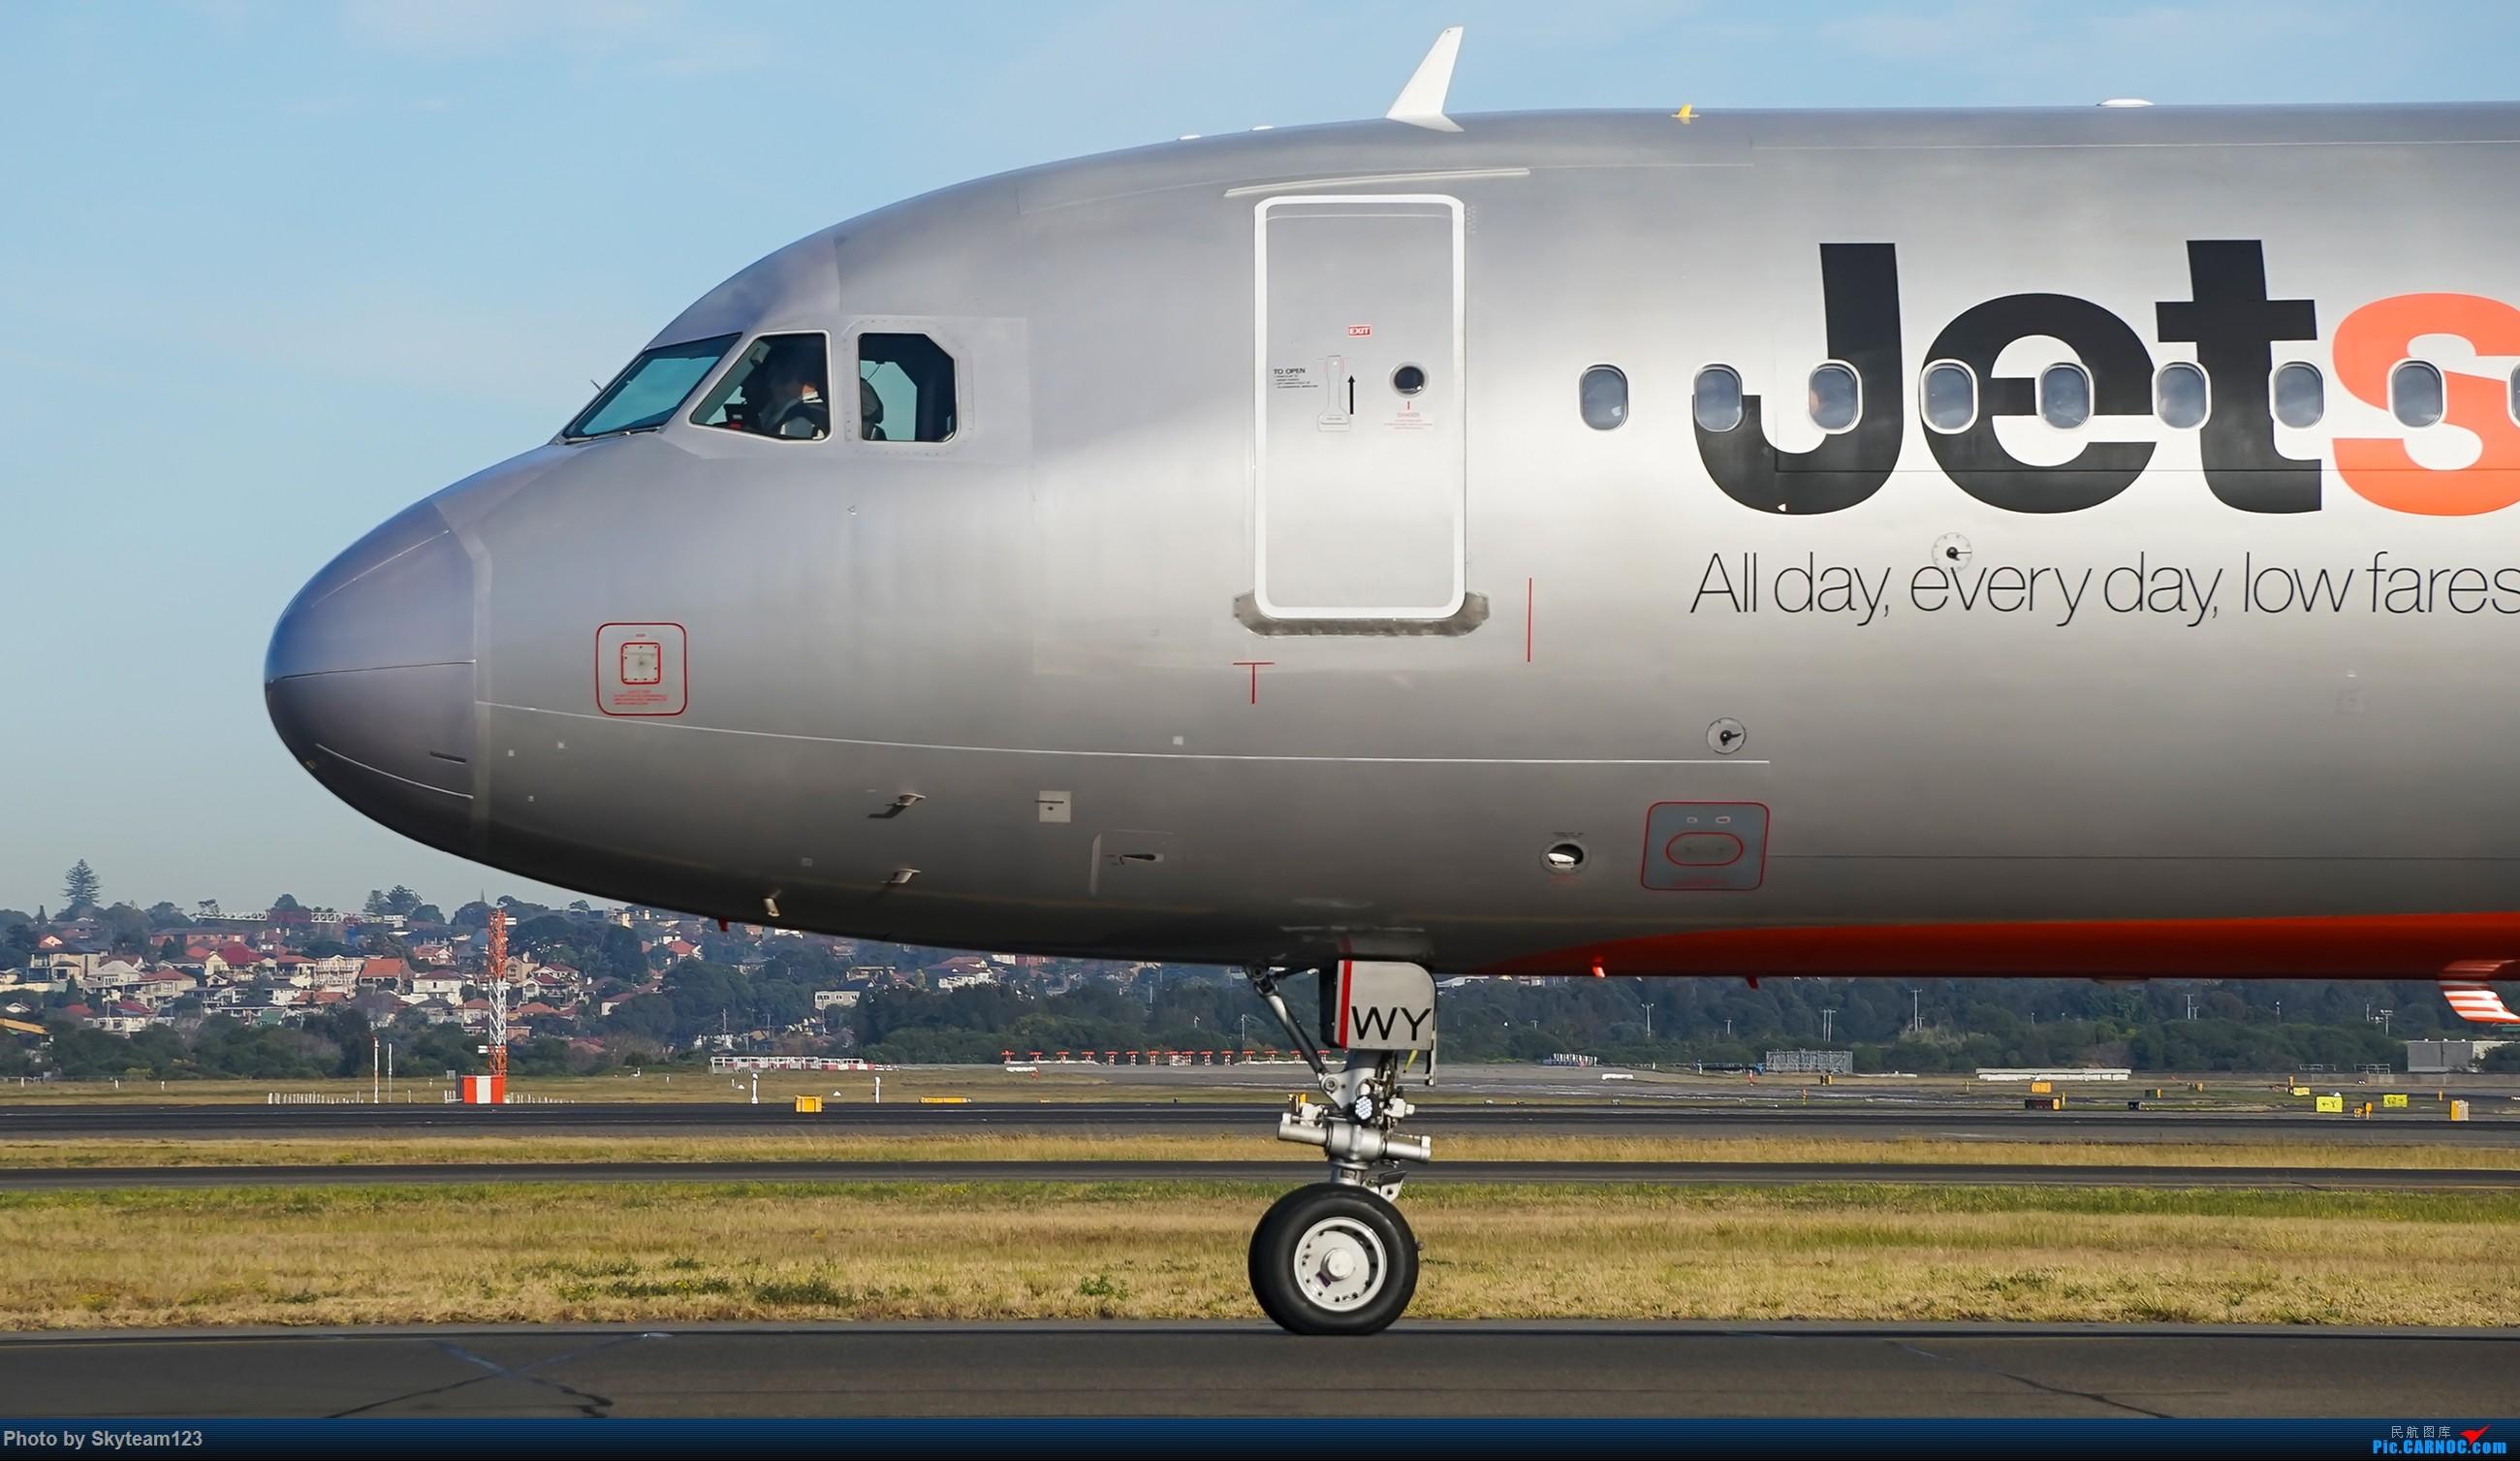 Re:[原创][SYD] 再访Blu EMU停车场 早上34L抵港出发杂图几张 AIRBUS A321 VH-VWY 澳大利亚悉尼金斯福德·史密斯机场